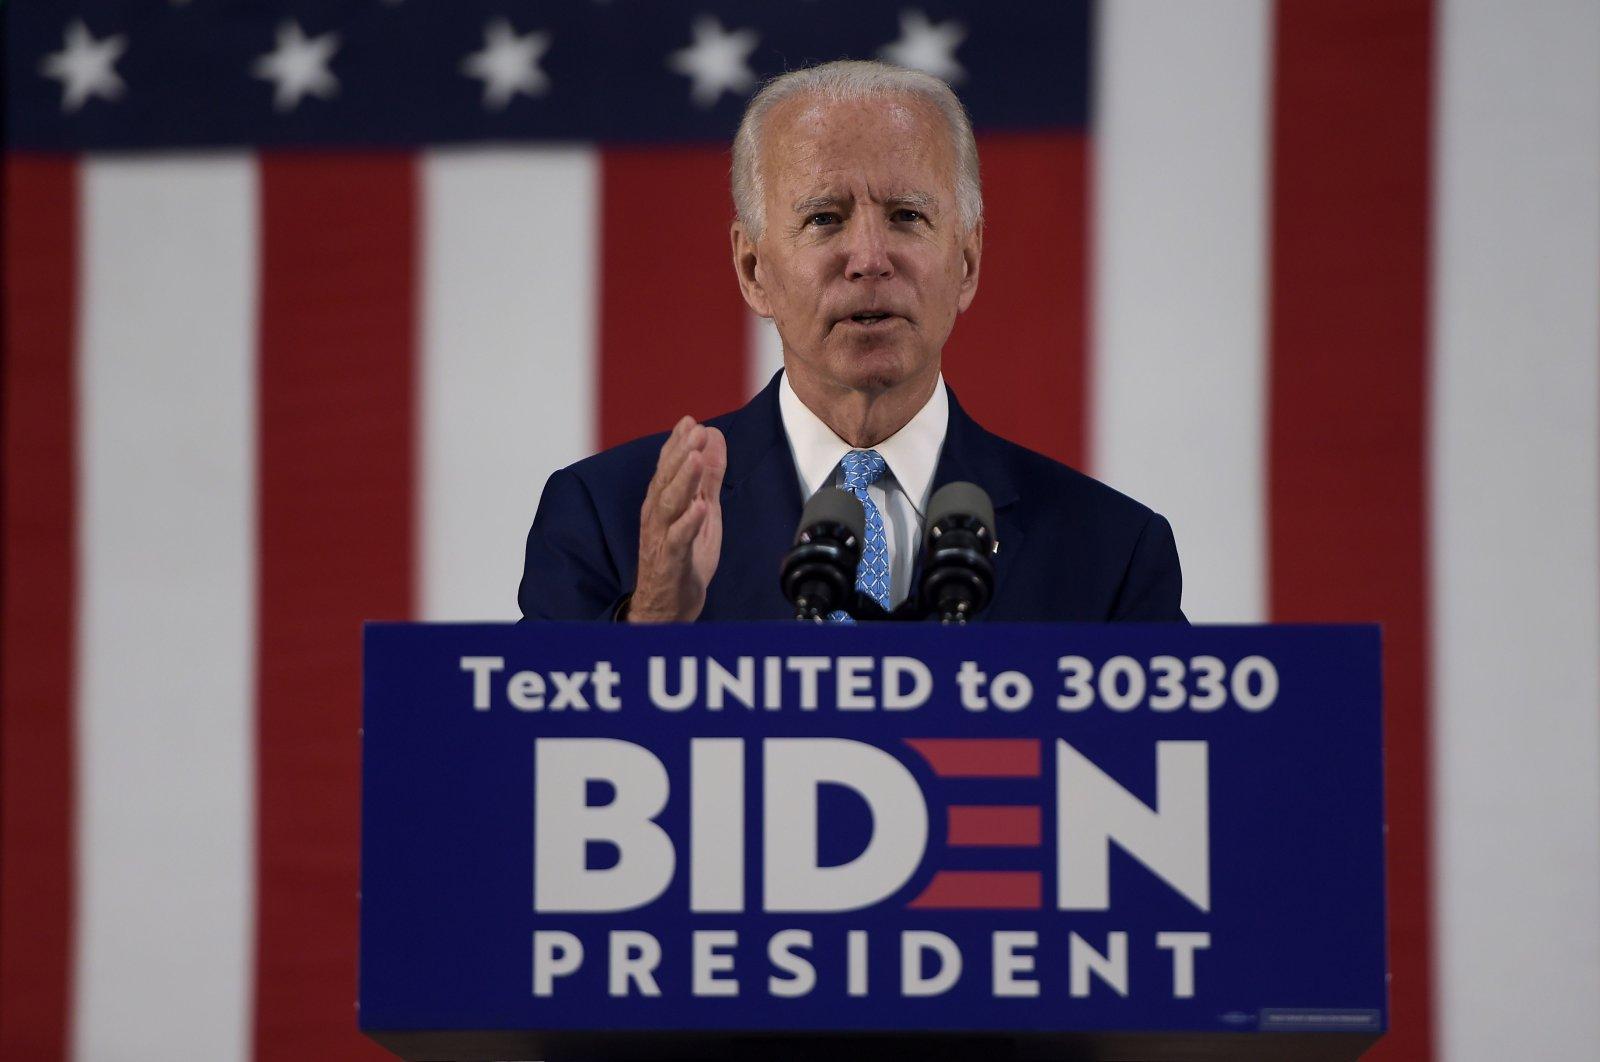 U.S. Democratic presidential candidate Joe Biden speaks in Wilmington, Delaware, U.S., June 30, 2020. (AFP Photo)